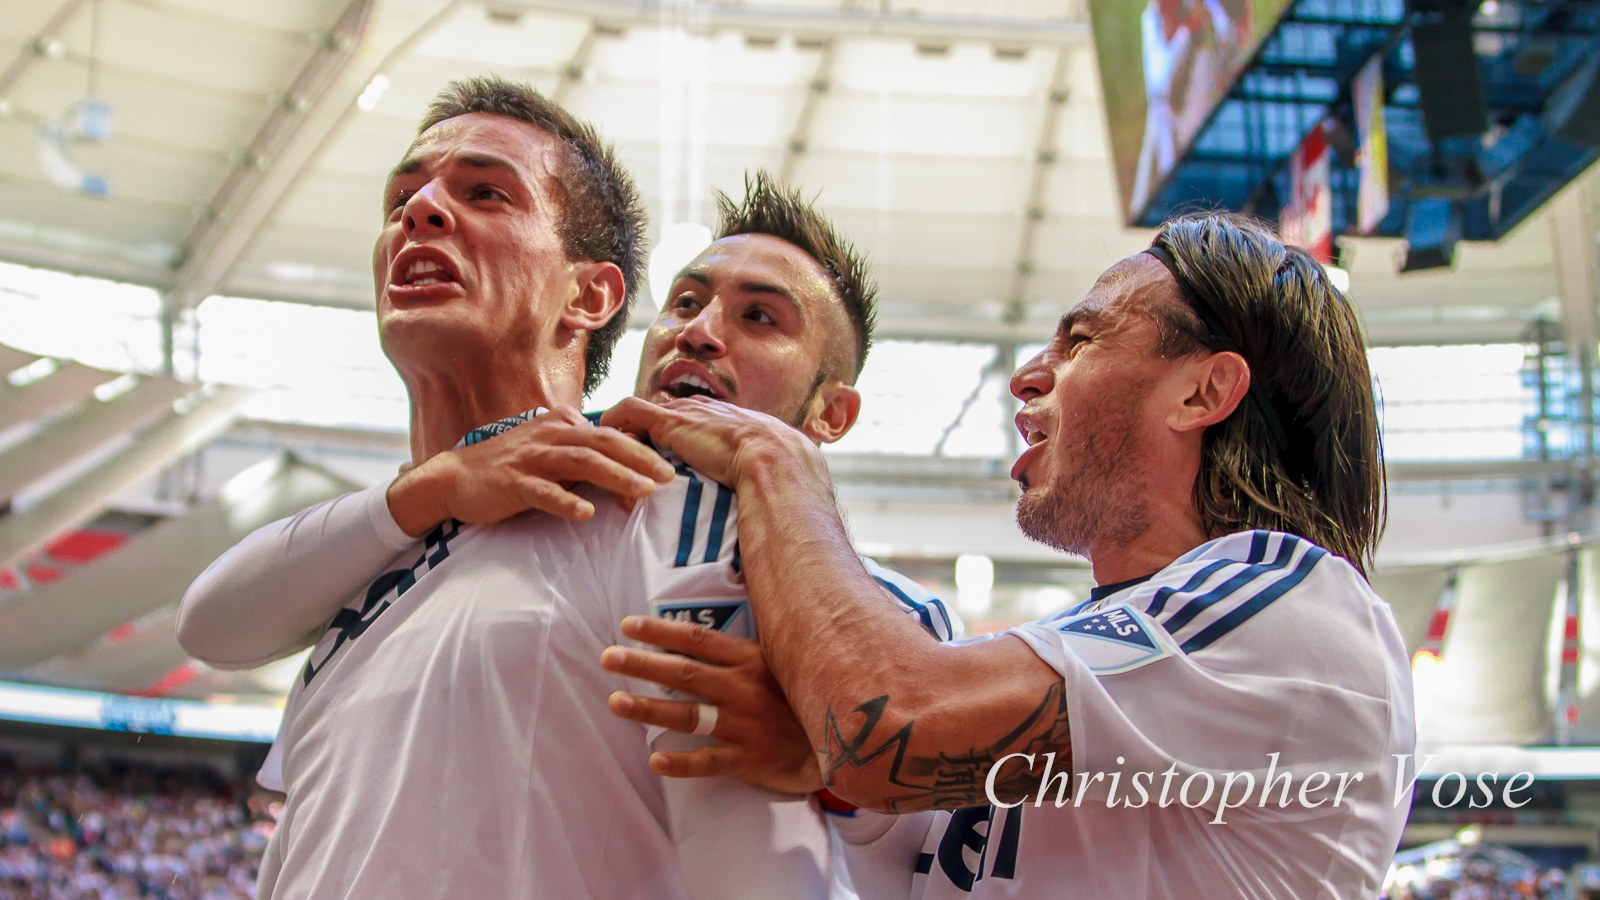 2015-03-07 Octavio Rivero Goal Celebration 5.jpg